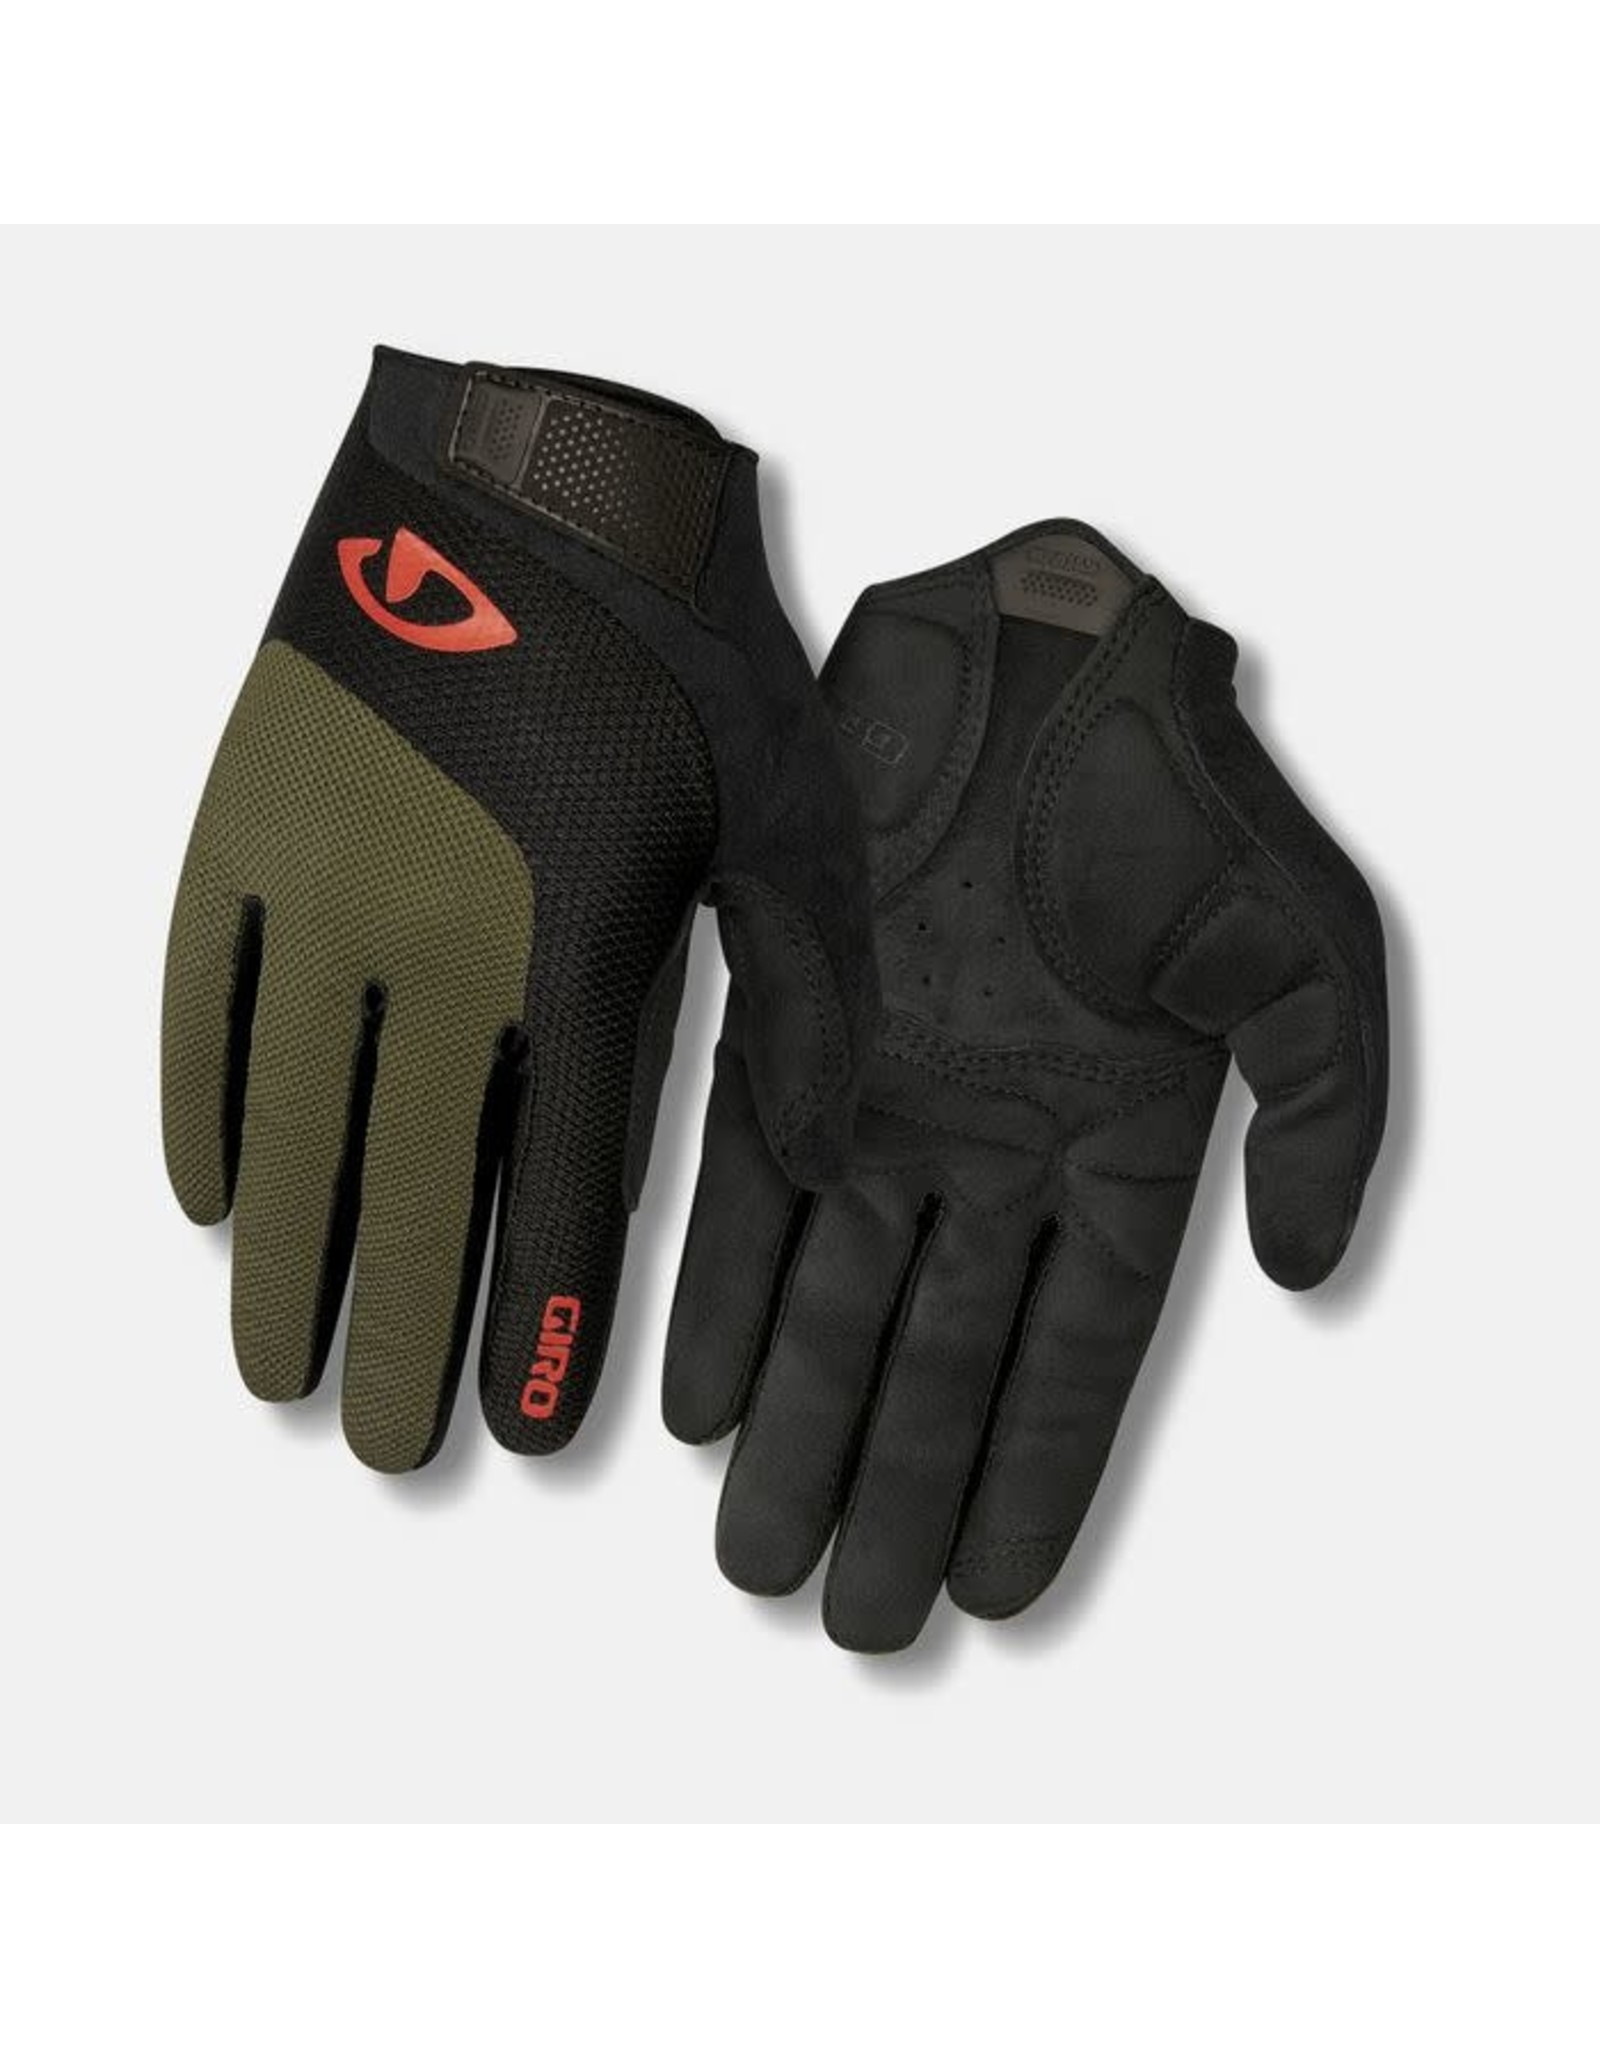 Giro Cycling Bravo Gel LF Glove